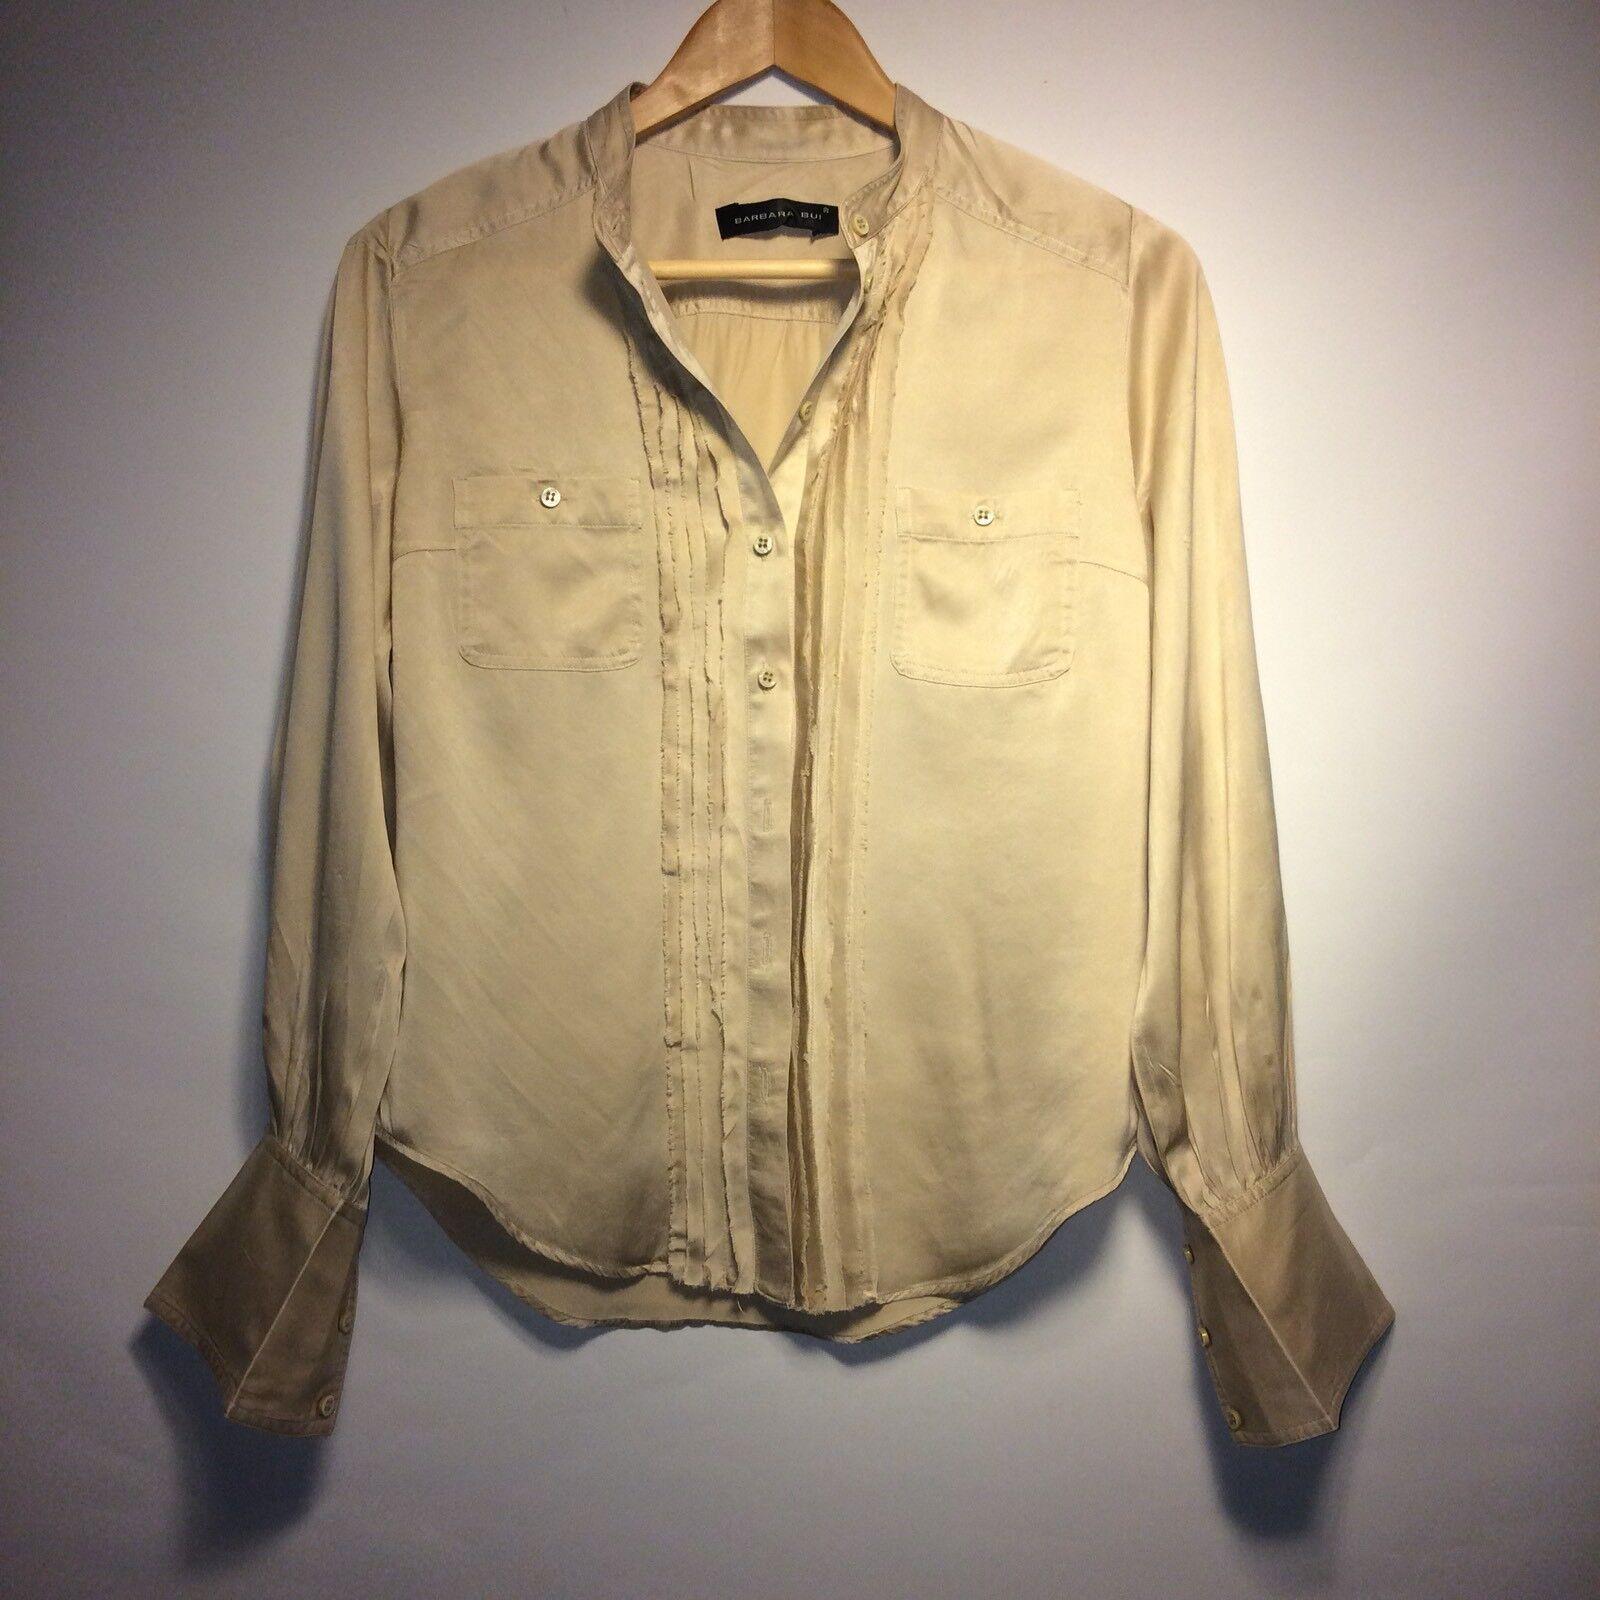 Barbara Bui Luxurious Silk Blouse Shirt Top Long Sleeve Größe 40 XS